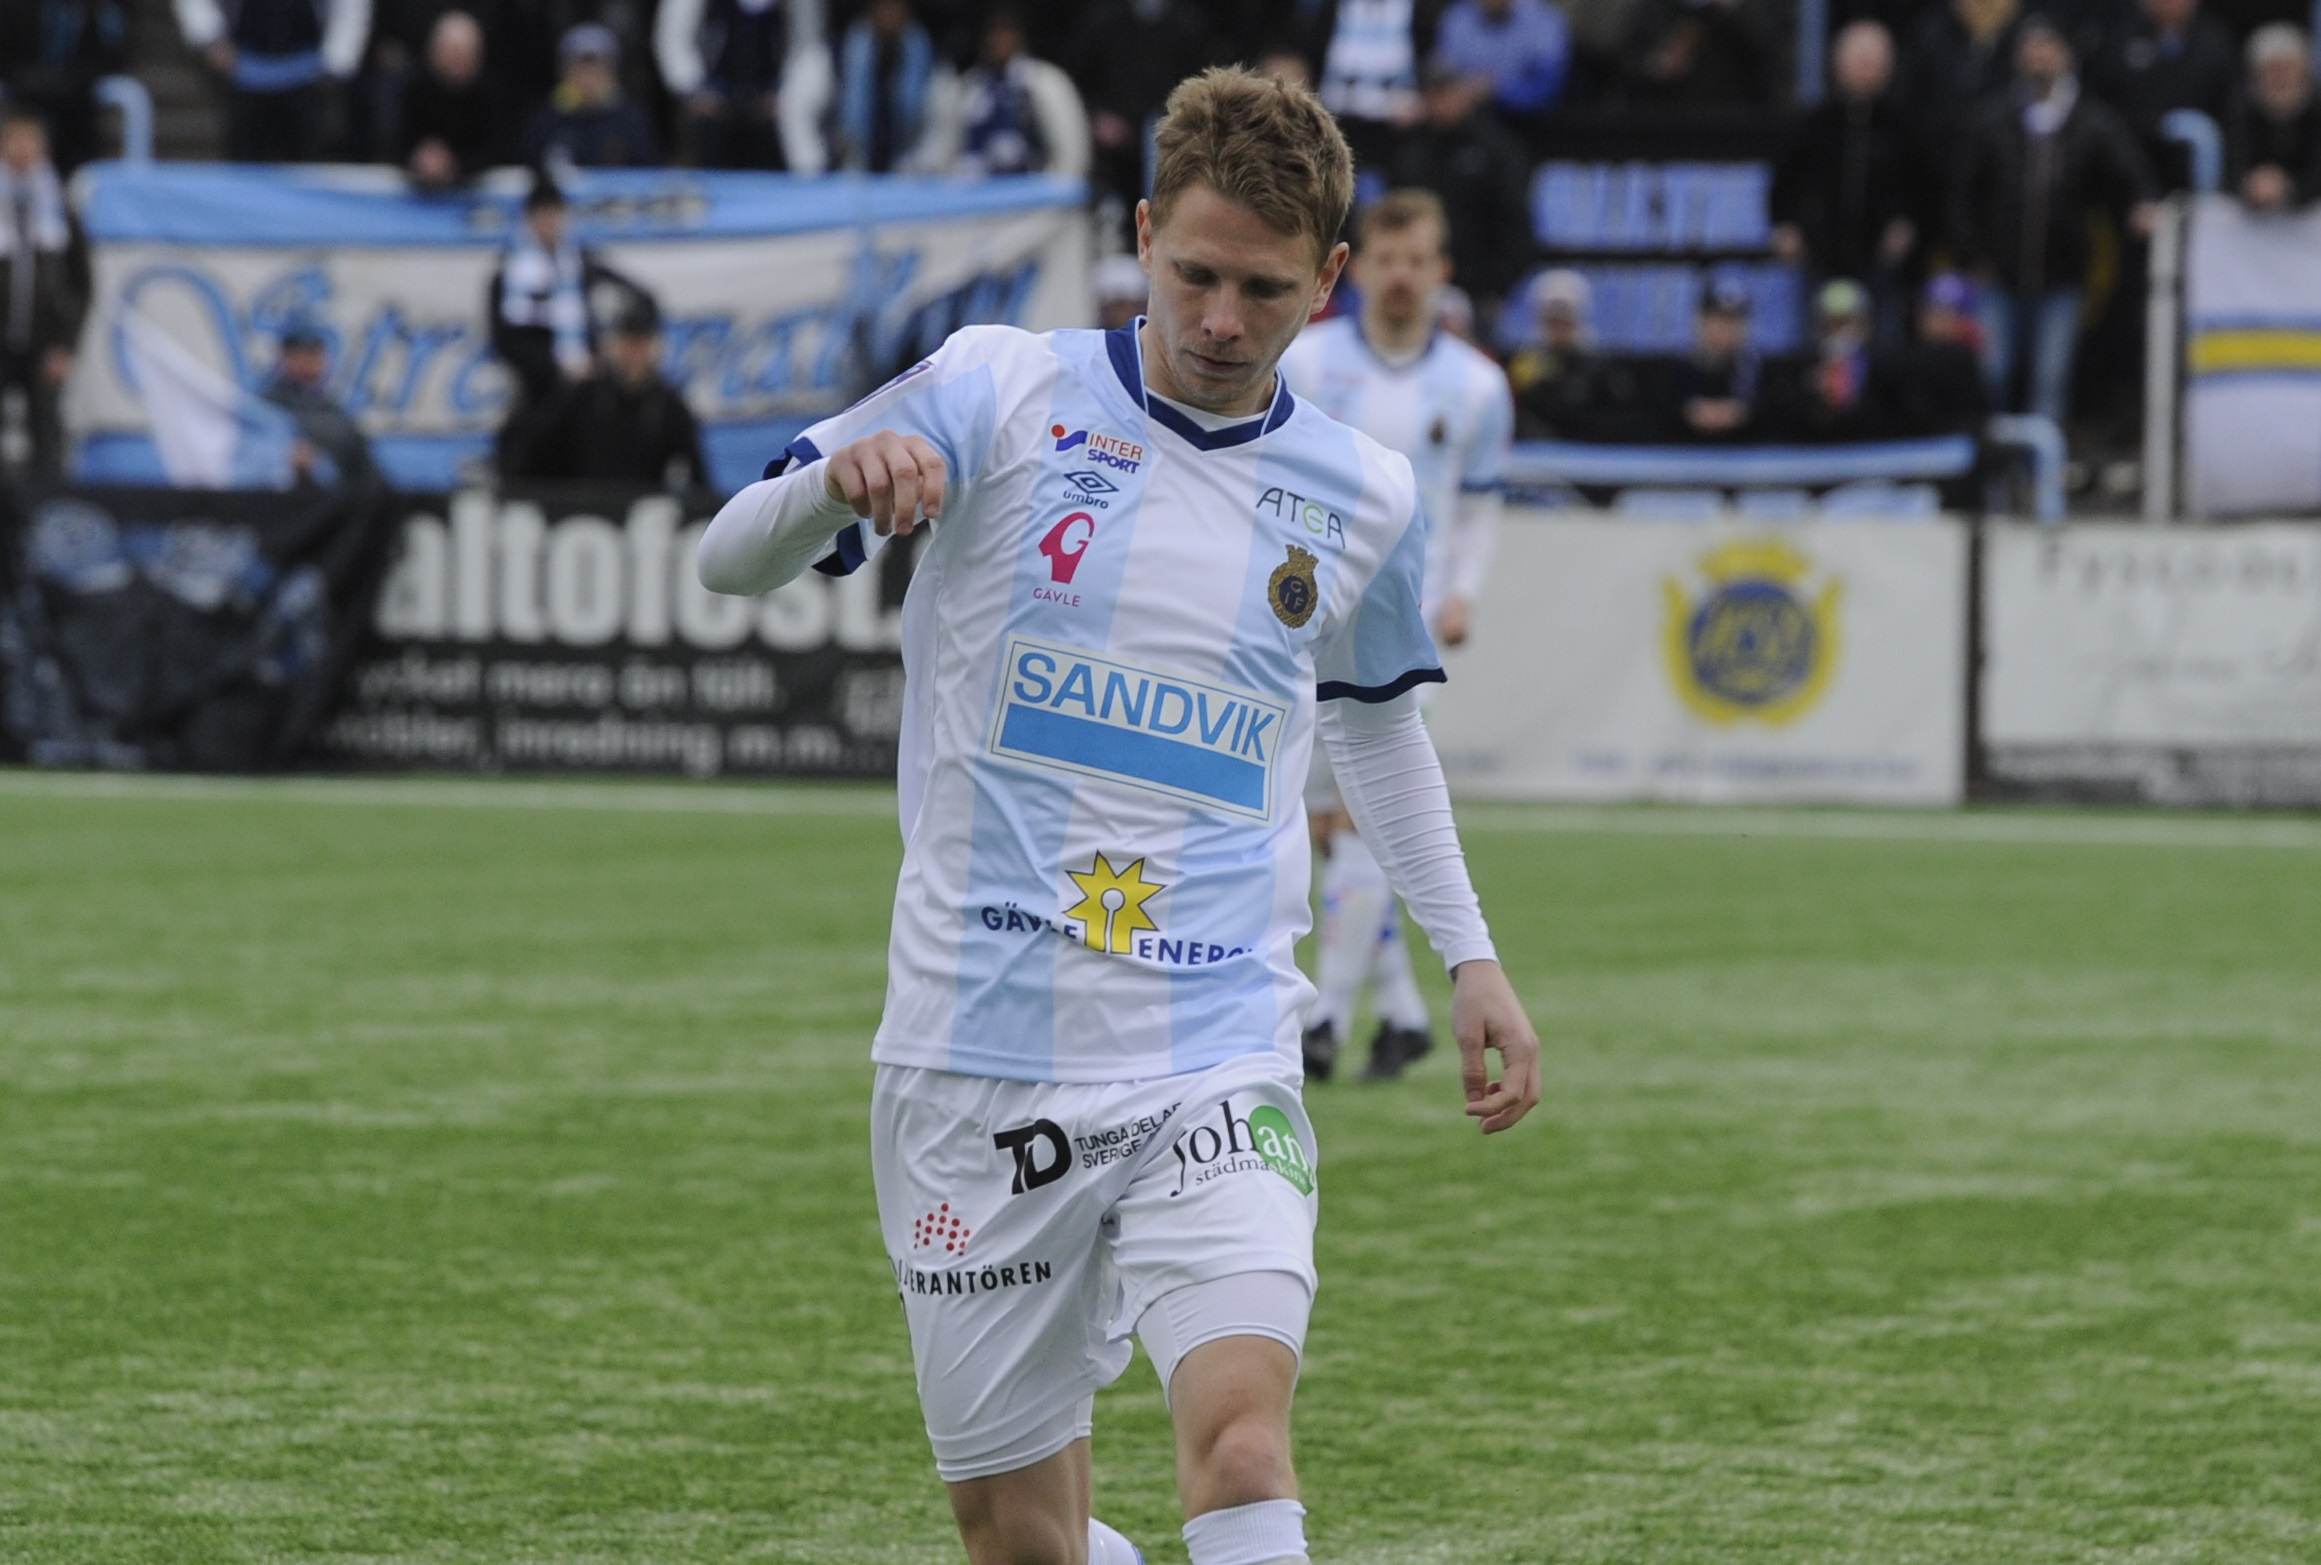 Ponturi fotbal – Gefle – Kalmar – Allsvenskan